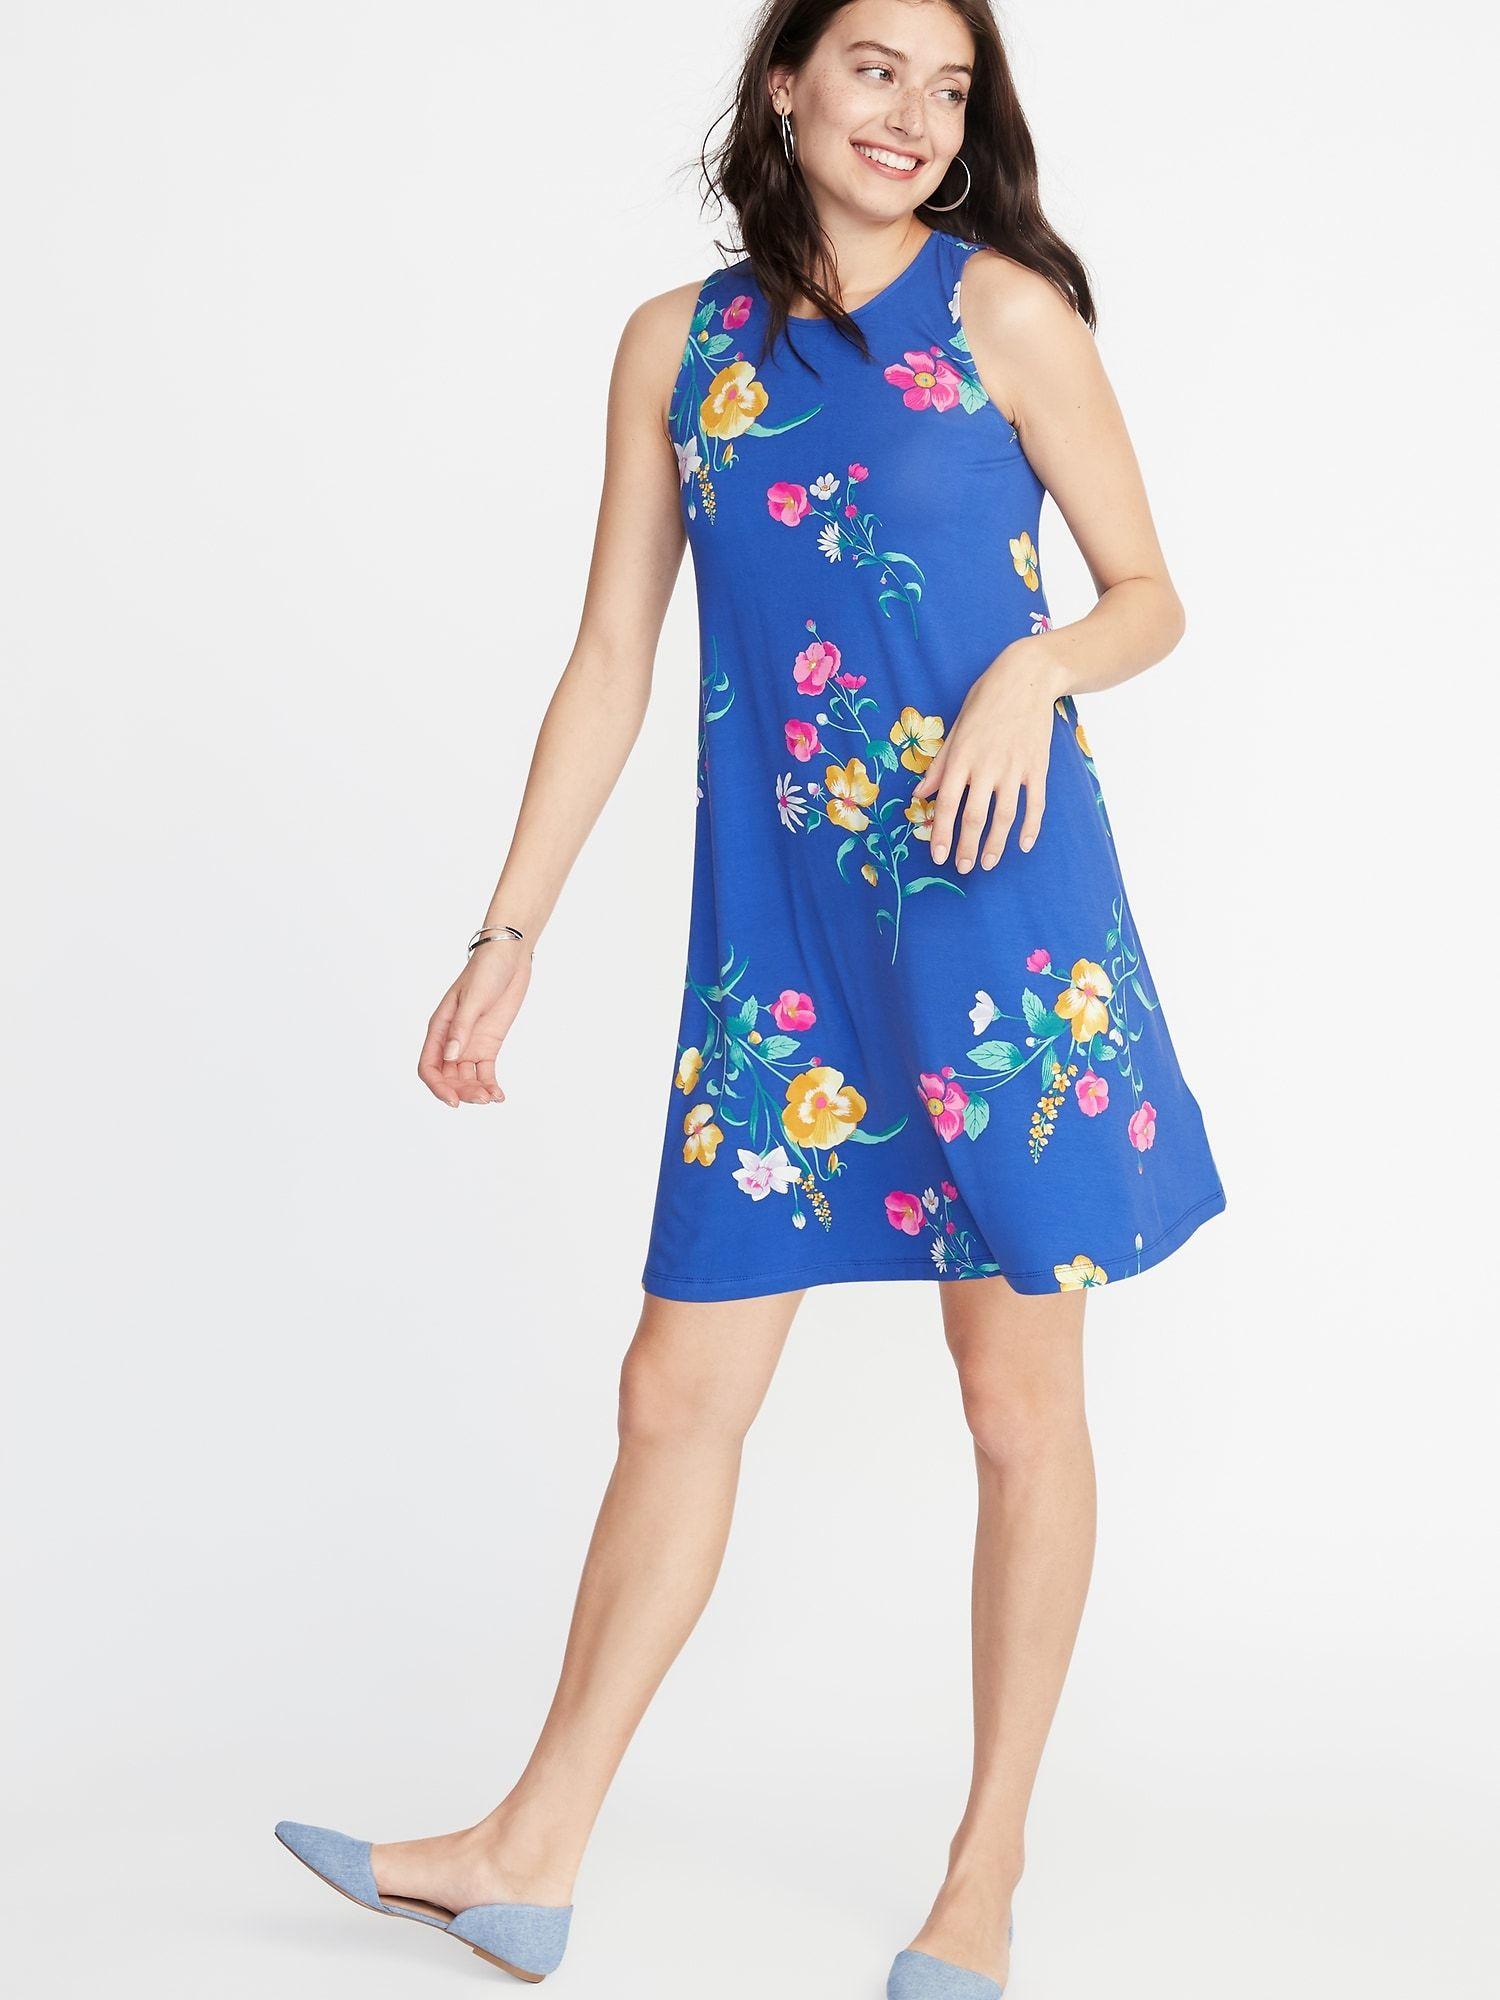 Sleeveless Jersey Swing Dress For Women Old Navy Jersey Swing Dress Fashion Womens Dresses [ 2000 x 1500 Pixel ]